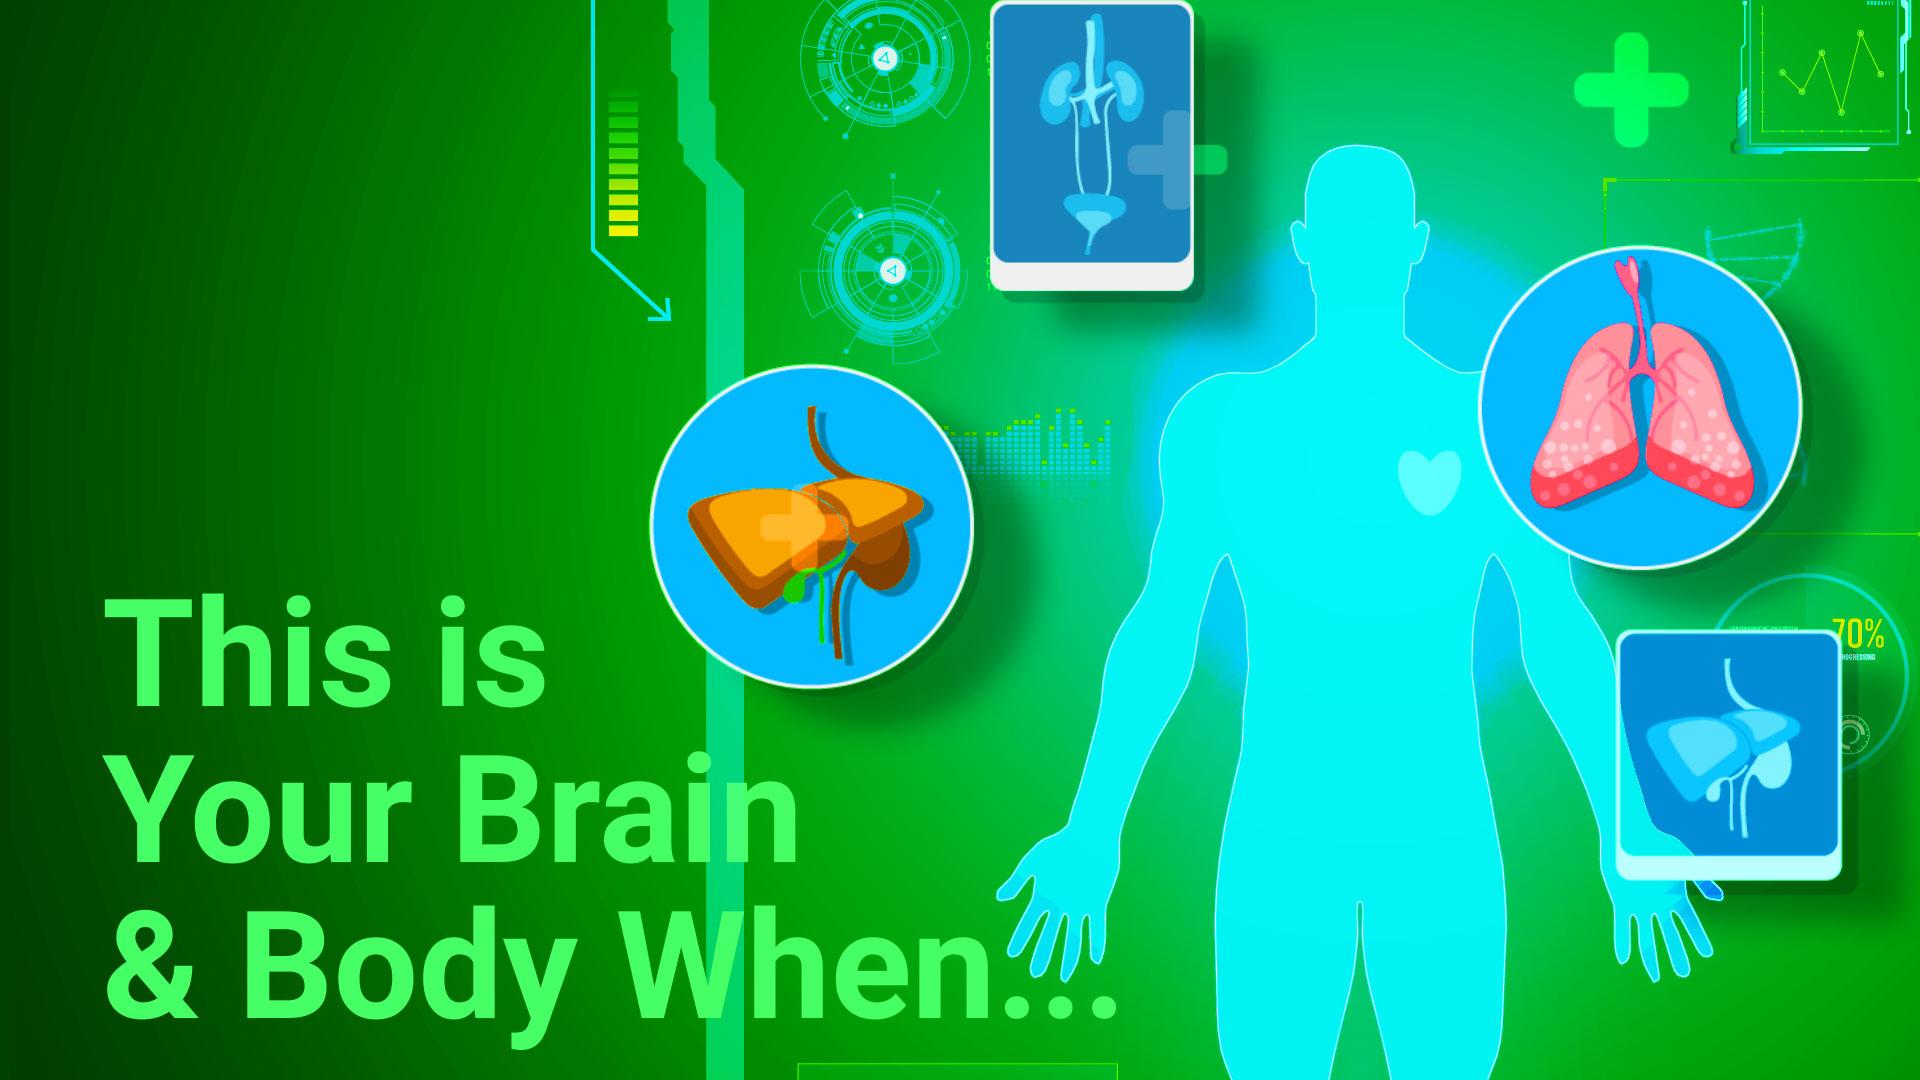 Amazon.com: This Is Your Brain & Body When...: Jessica Orwig, Gene ...